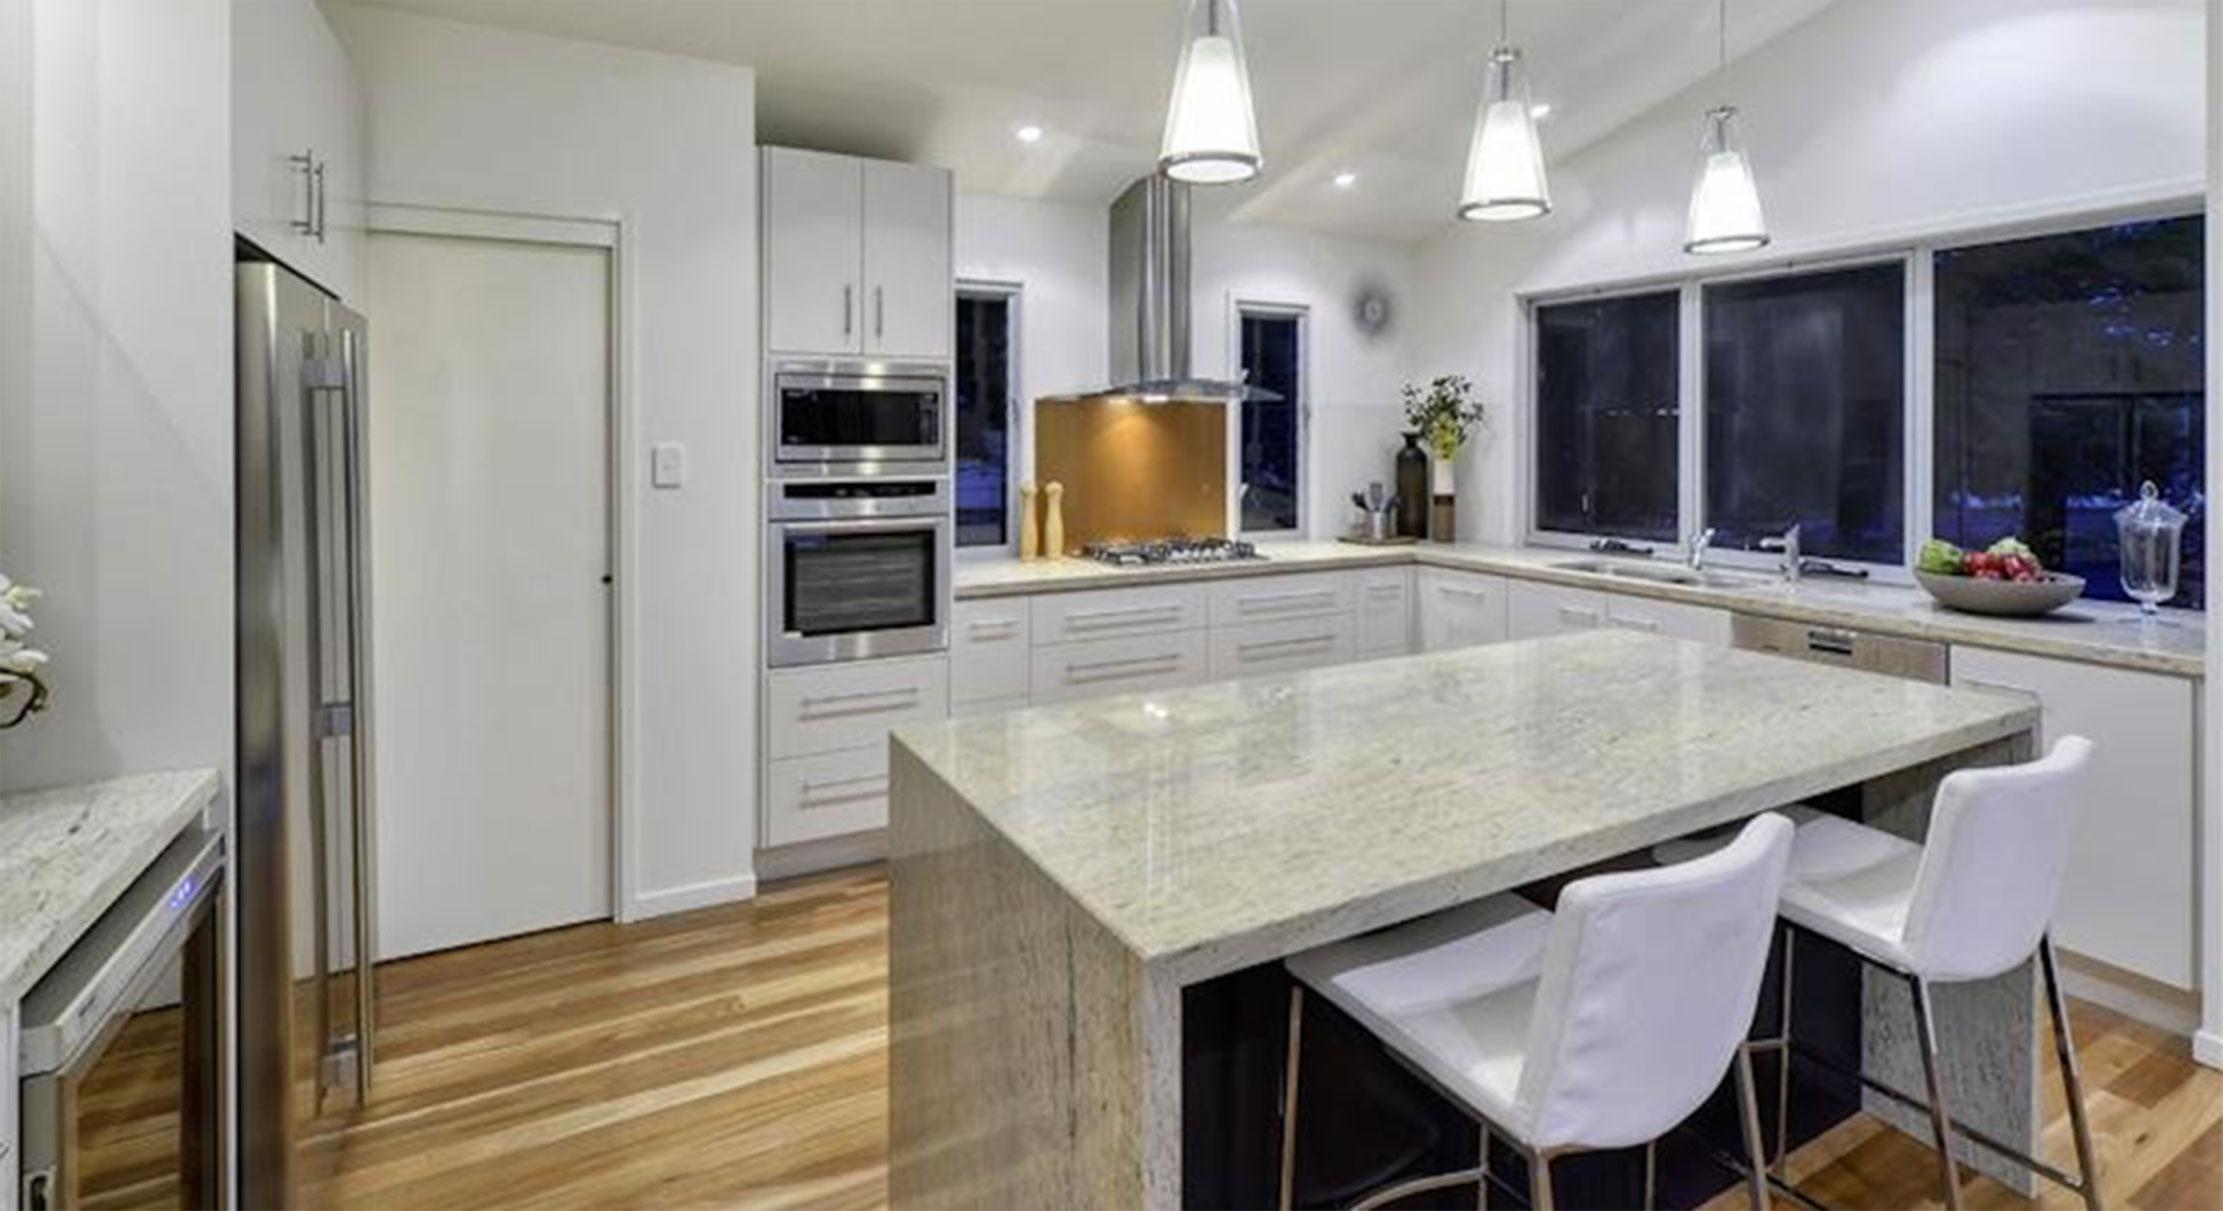 portfolio-2-slider-image-8-kitchen-newmarket-gary-cramb-constructions-brisbane